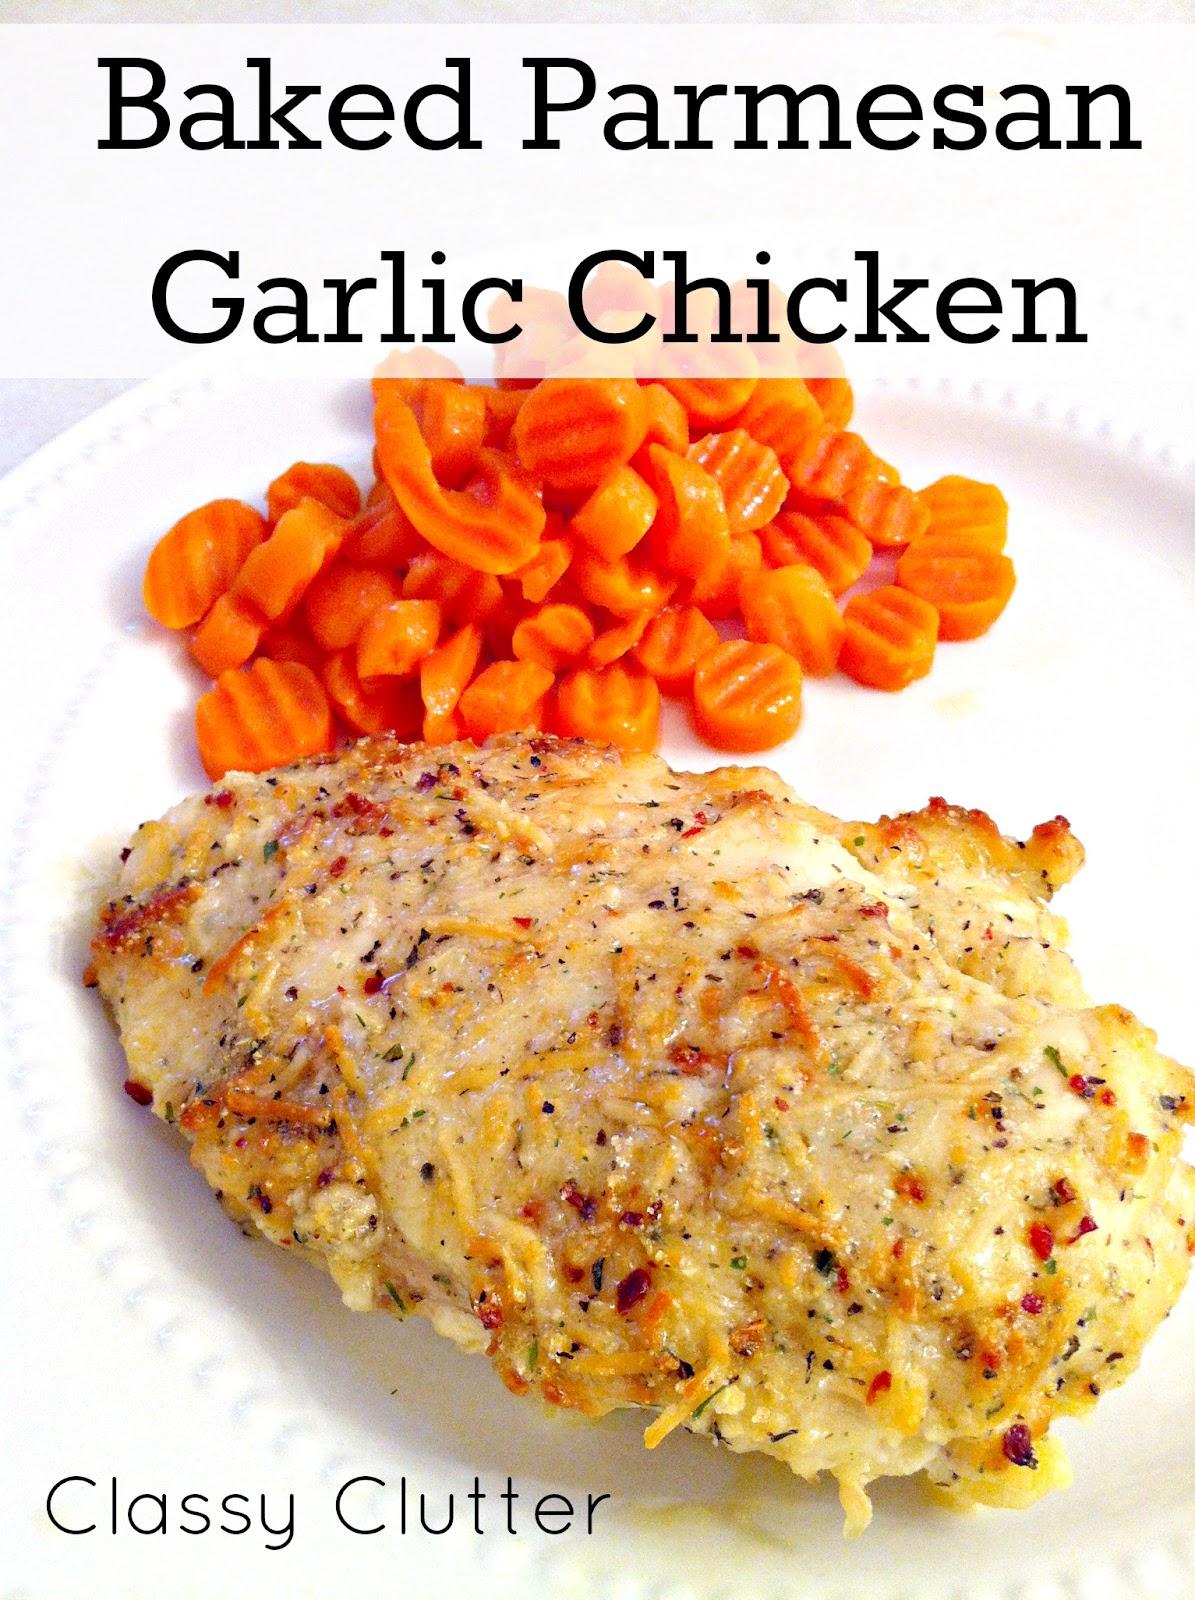 Baked Parmesan Garlic Chicken Classy Clutter